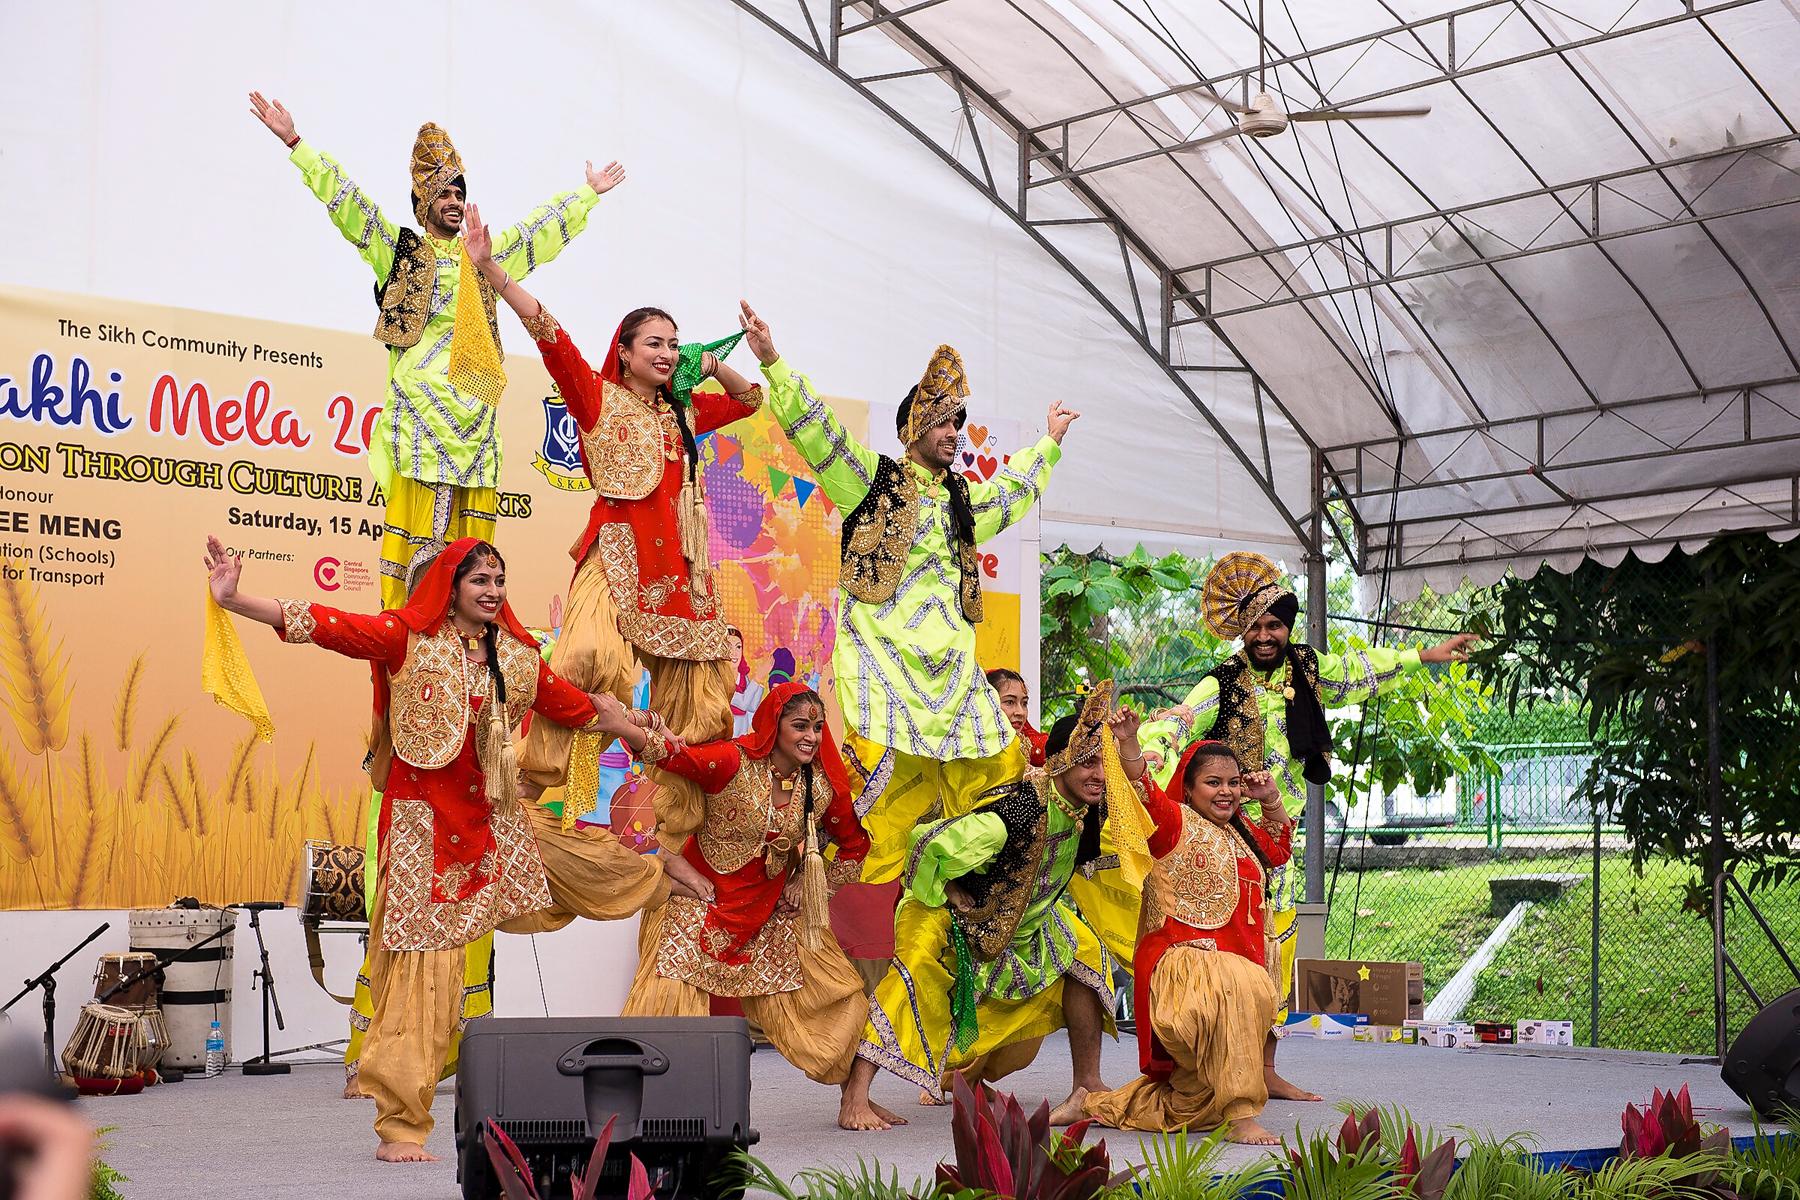 Bhangra performance is a popular feature of Vesakhi Mela. Photo courtesy: SKA